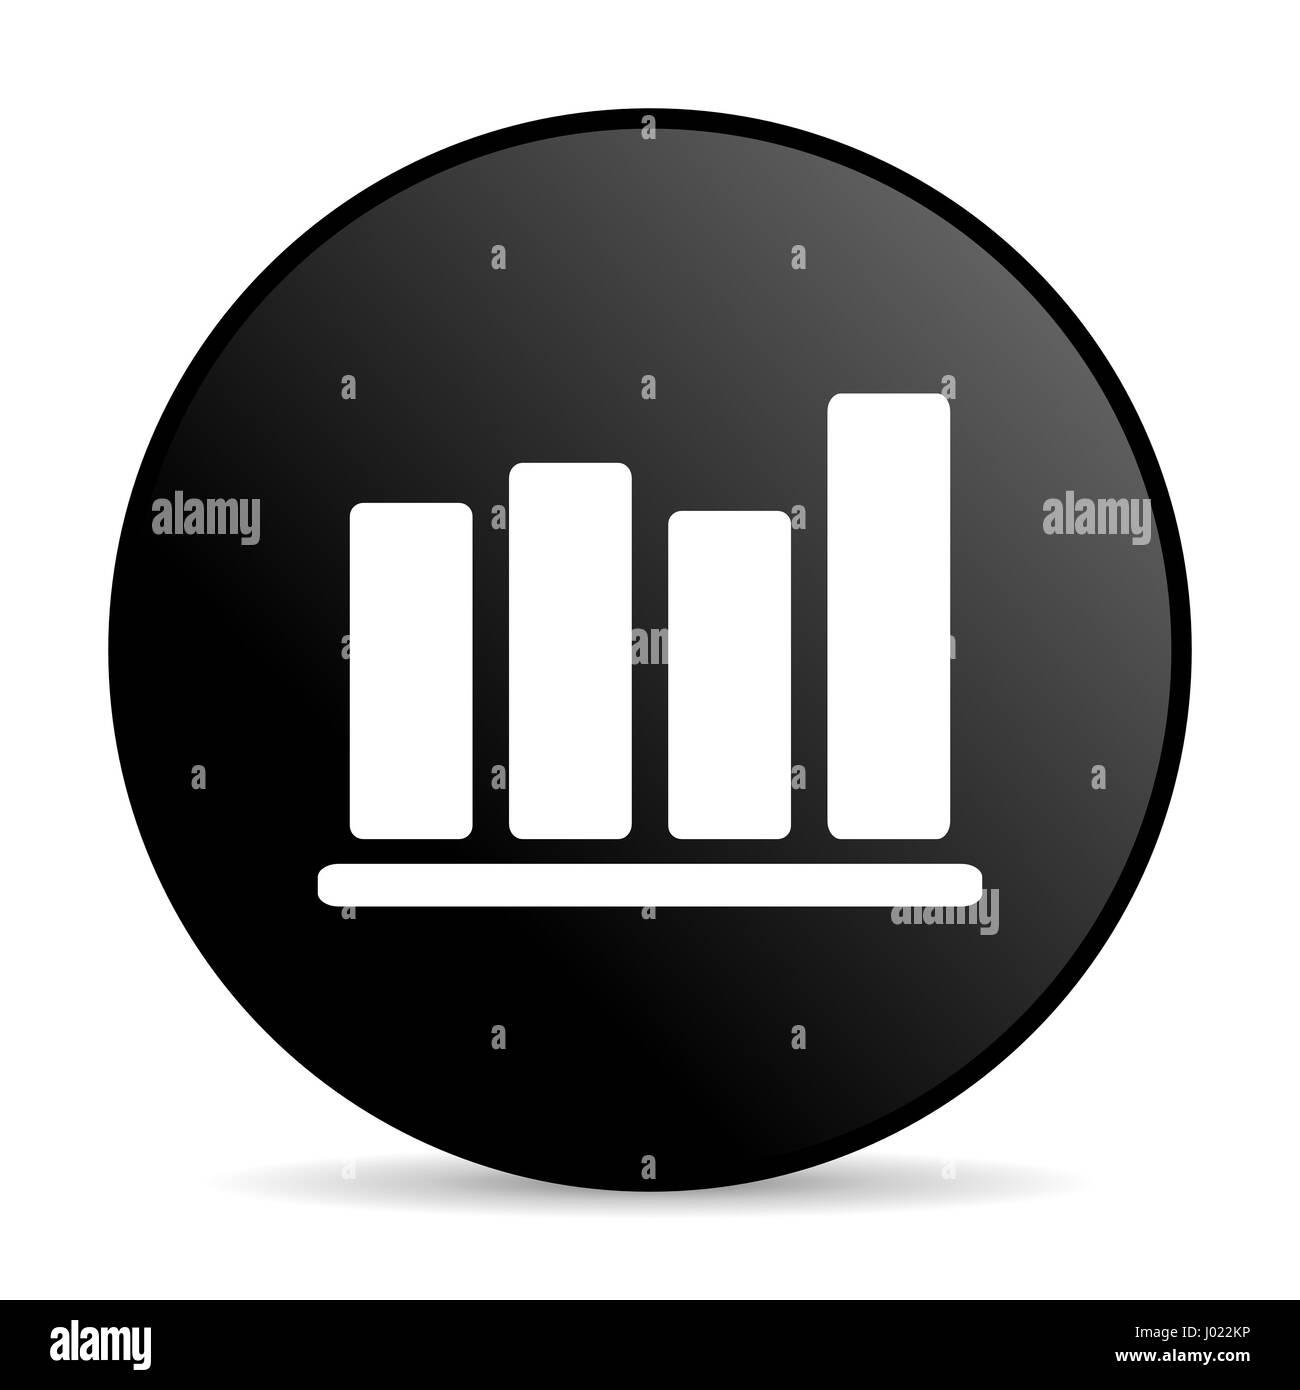 bar chart black and white stock photos images alamy rh alamy com